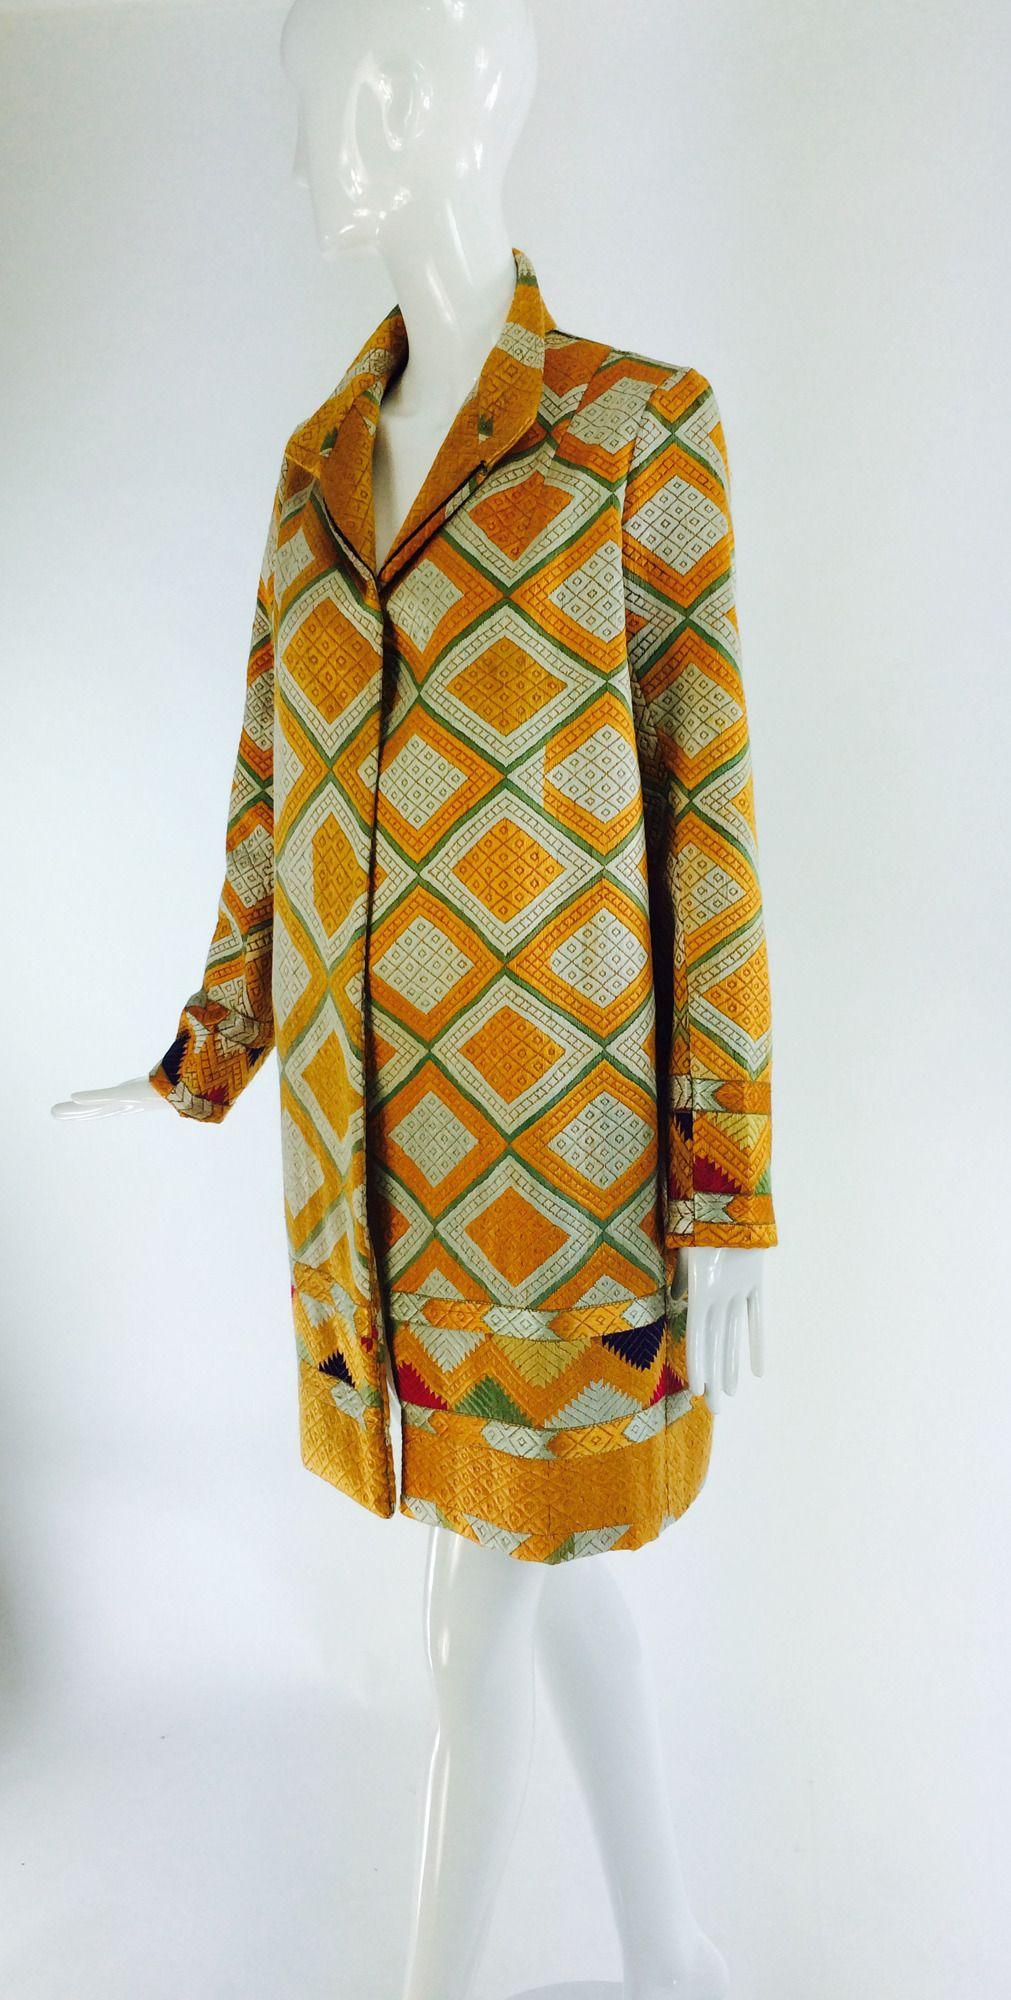 S punjab phulkari silk embroidered chand bagh coat phulkari